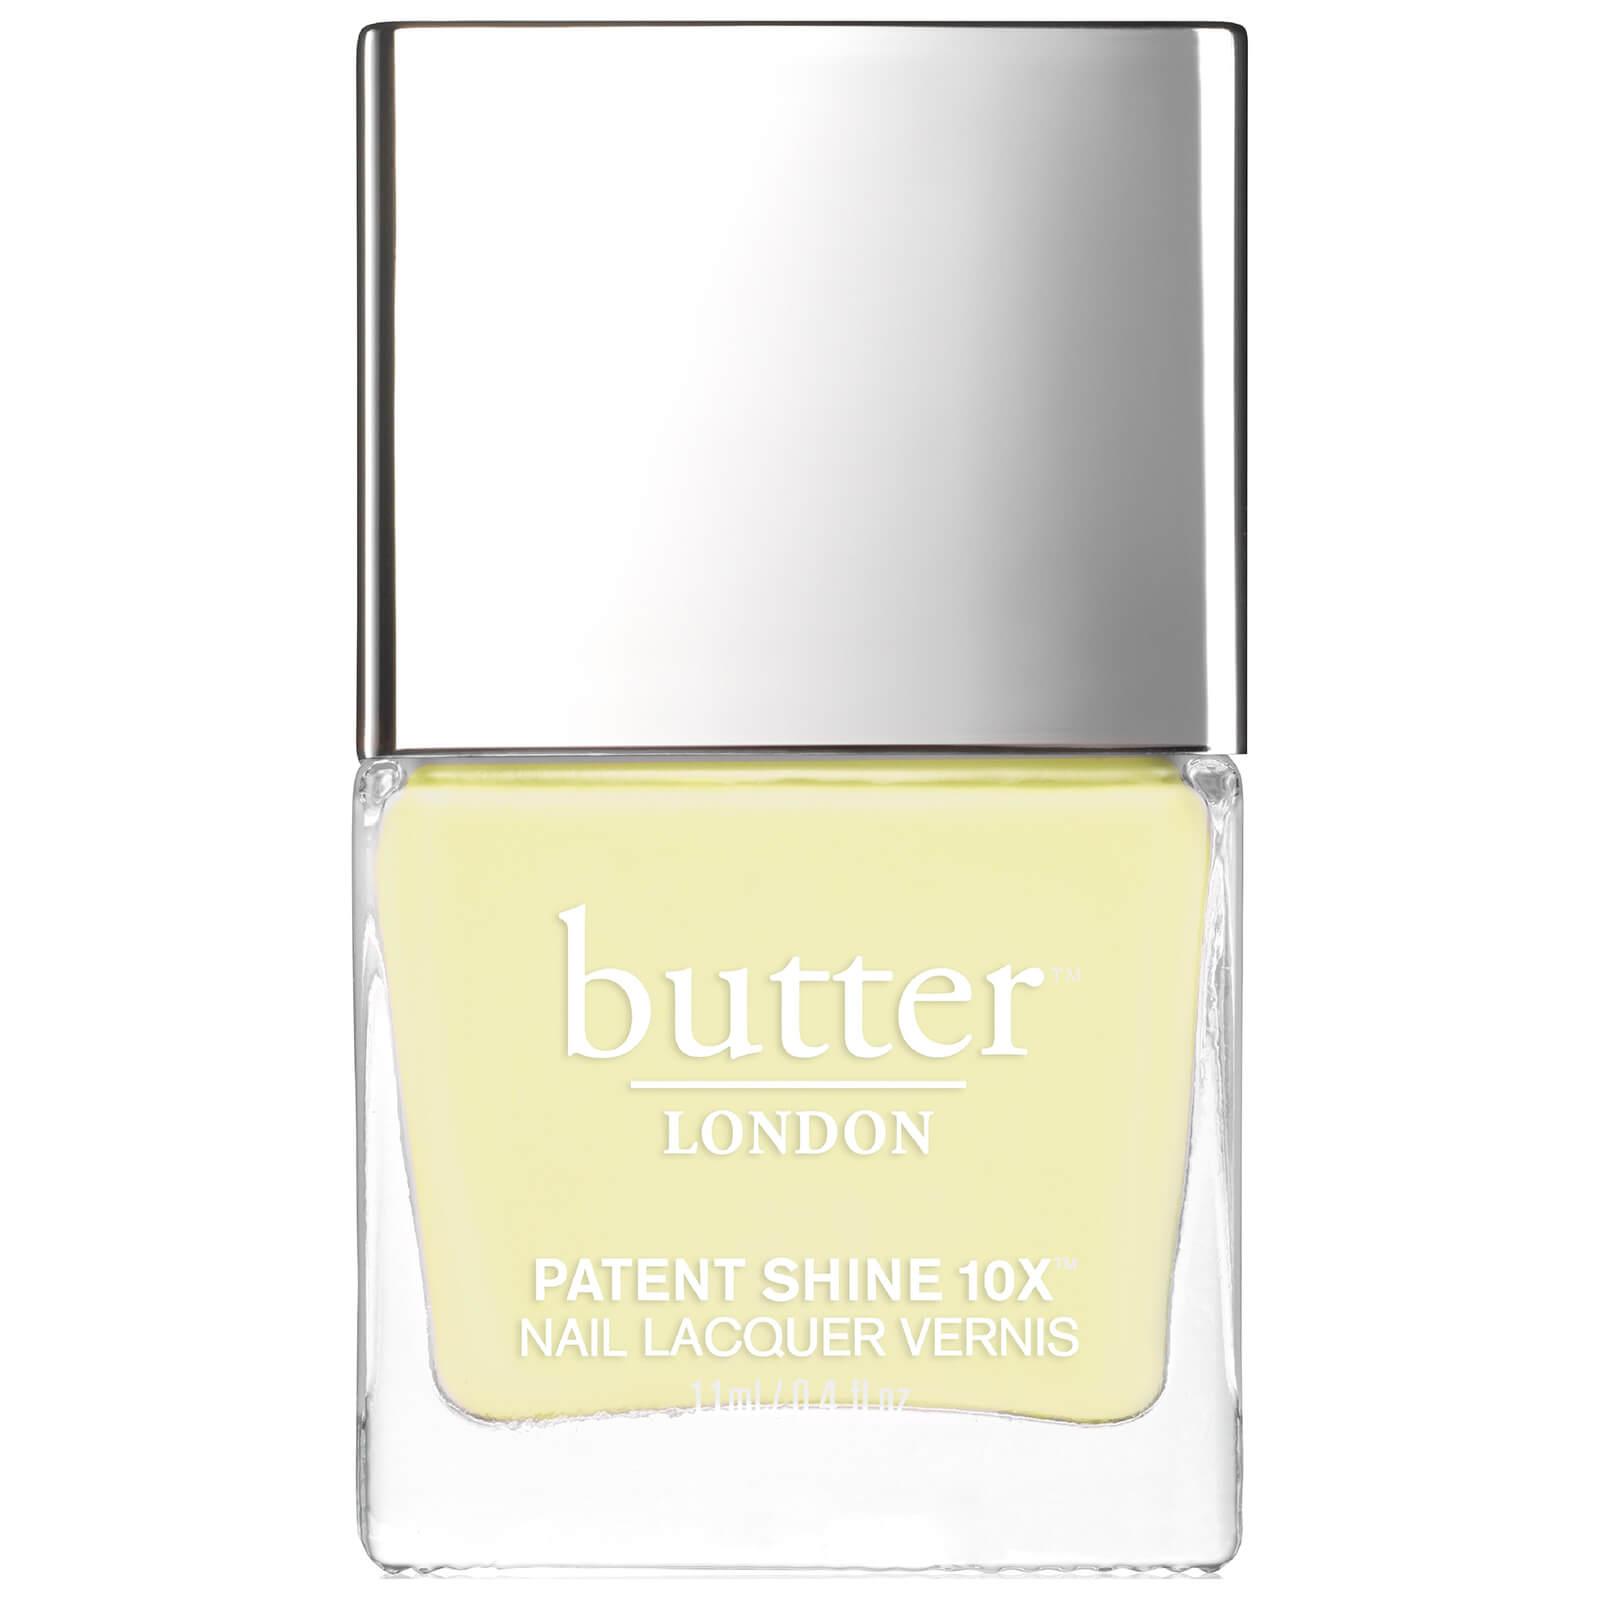 Esmalte de uñas Patent Shine 10X de butter LONDON Lemon Drop